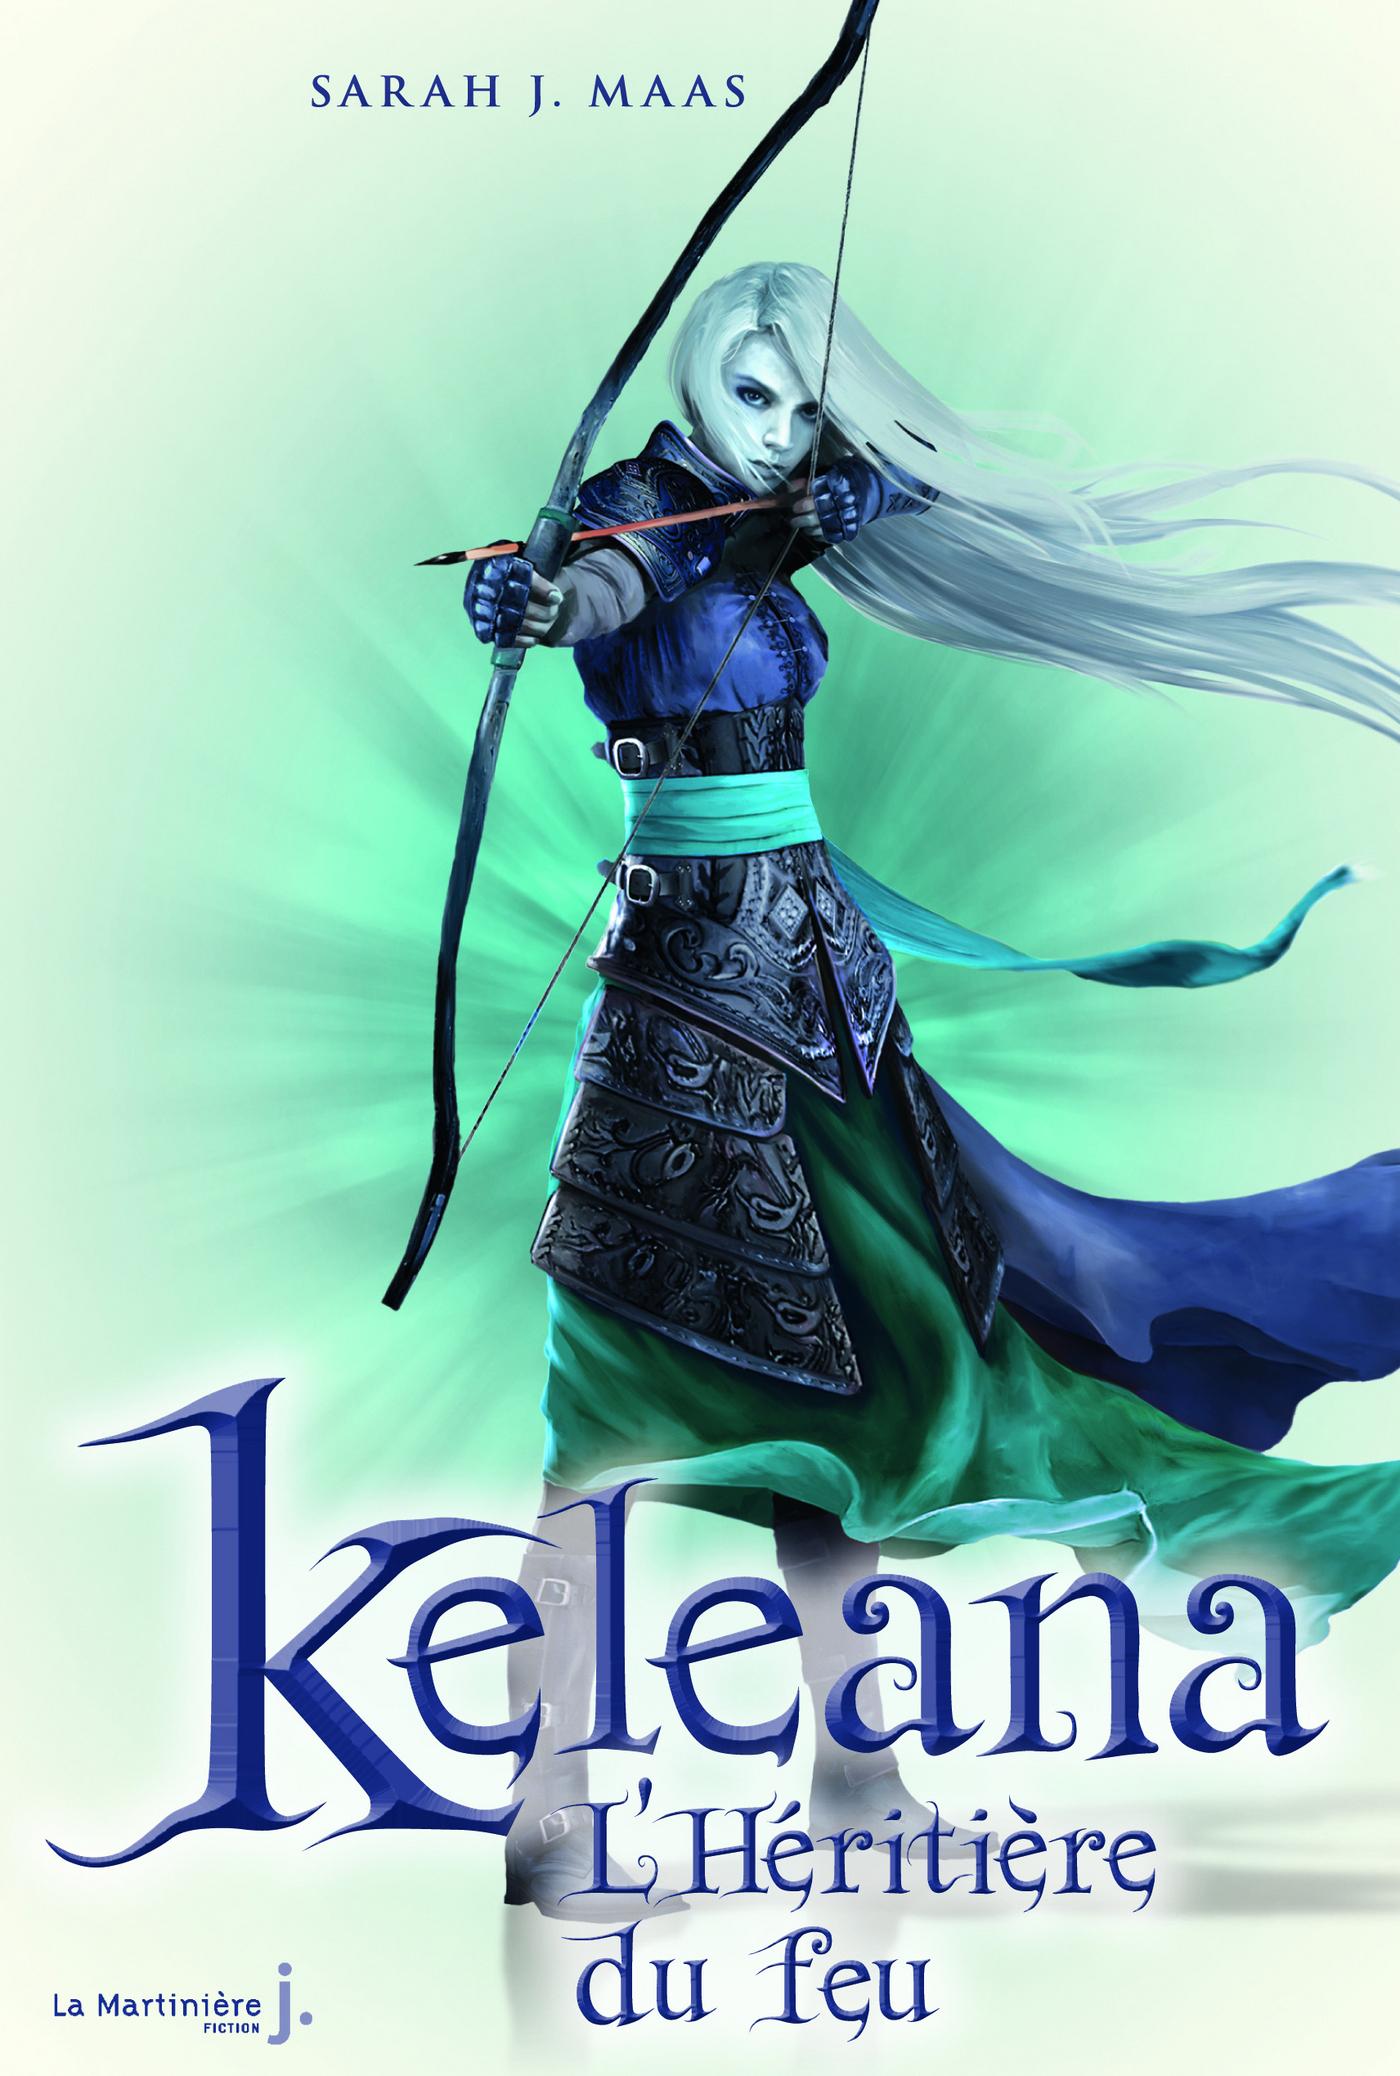 L'Héritière du feu. Keleana...